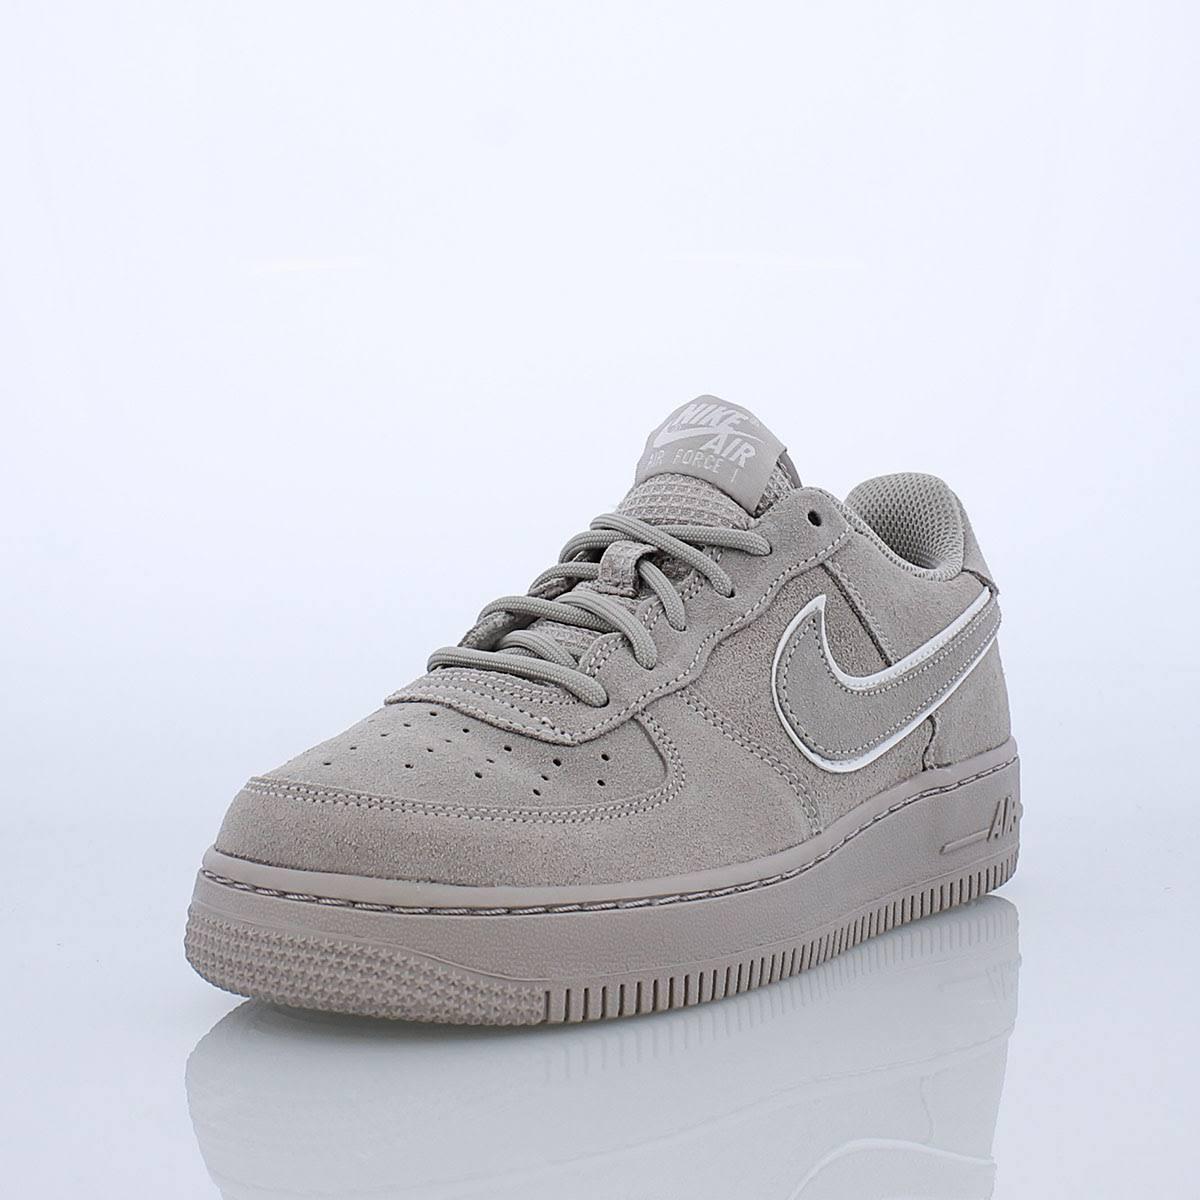 Ao2285200 Low Para 5 Calzado 1 Air Force De Niños Nike Grado 5 Tamaño Escuela ZqwvAxH